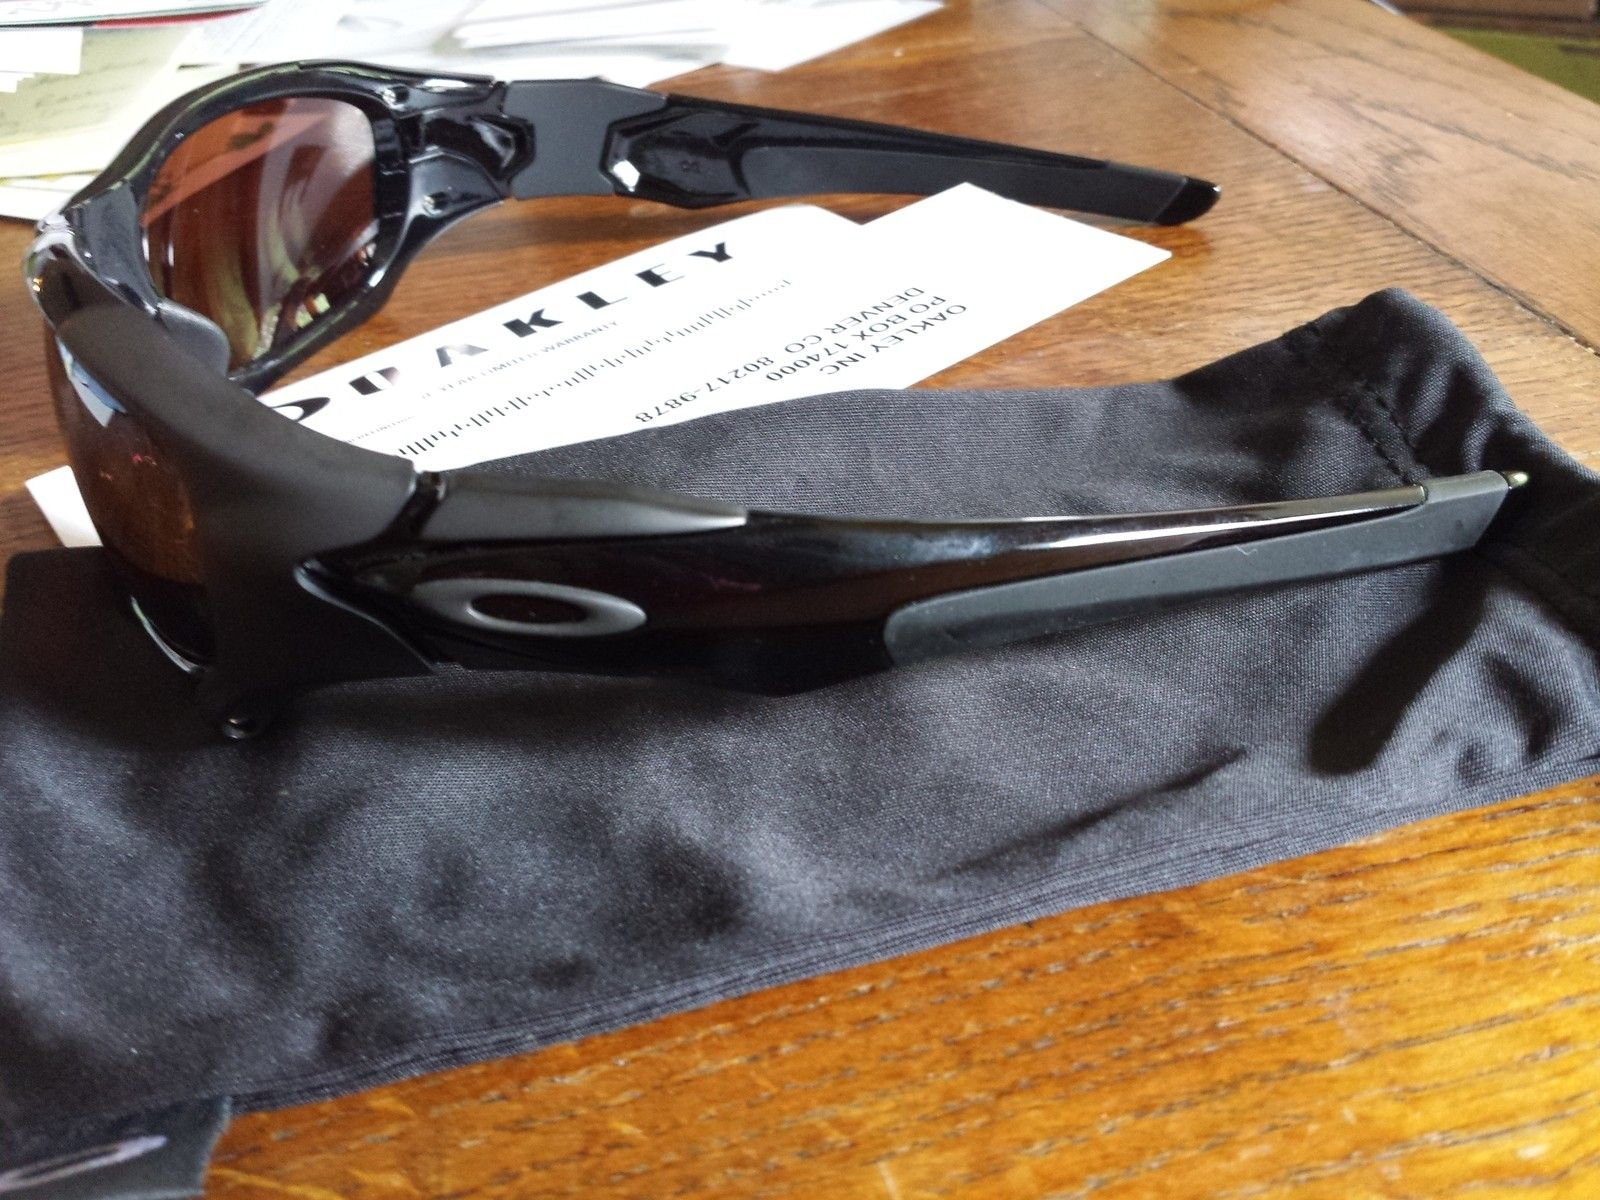 BNIB Pit Boss 2, polished black - uploadfromtaptalk1436373899325.jpg